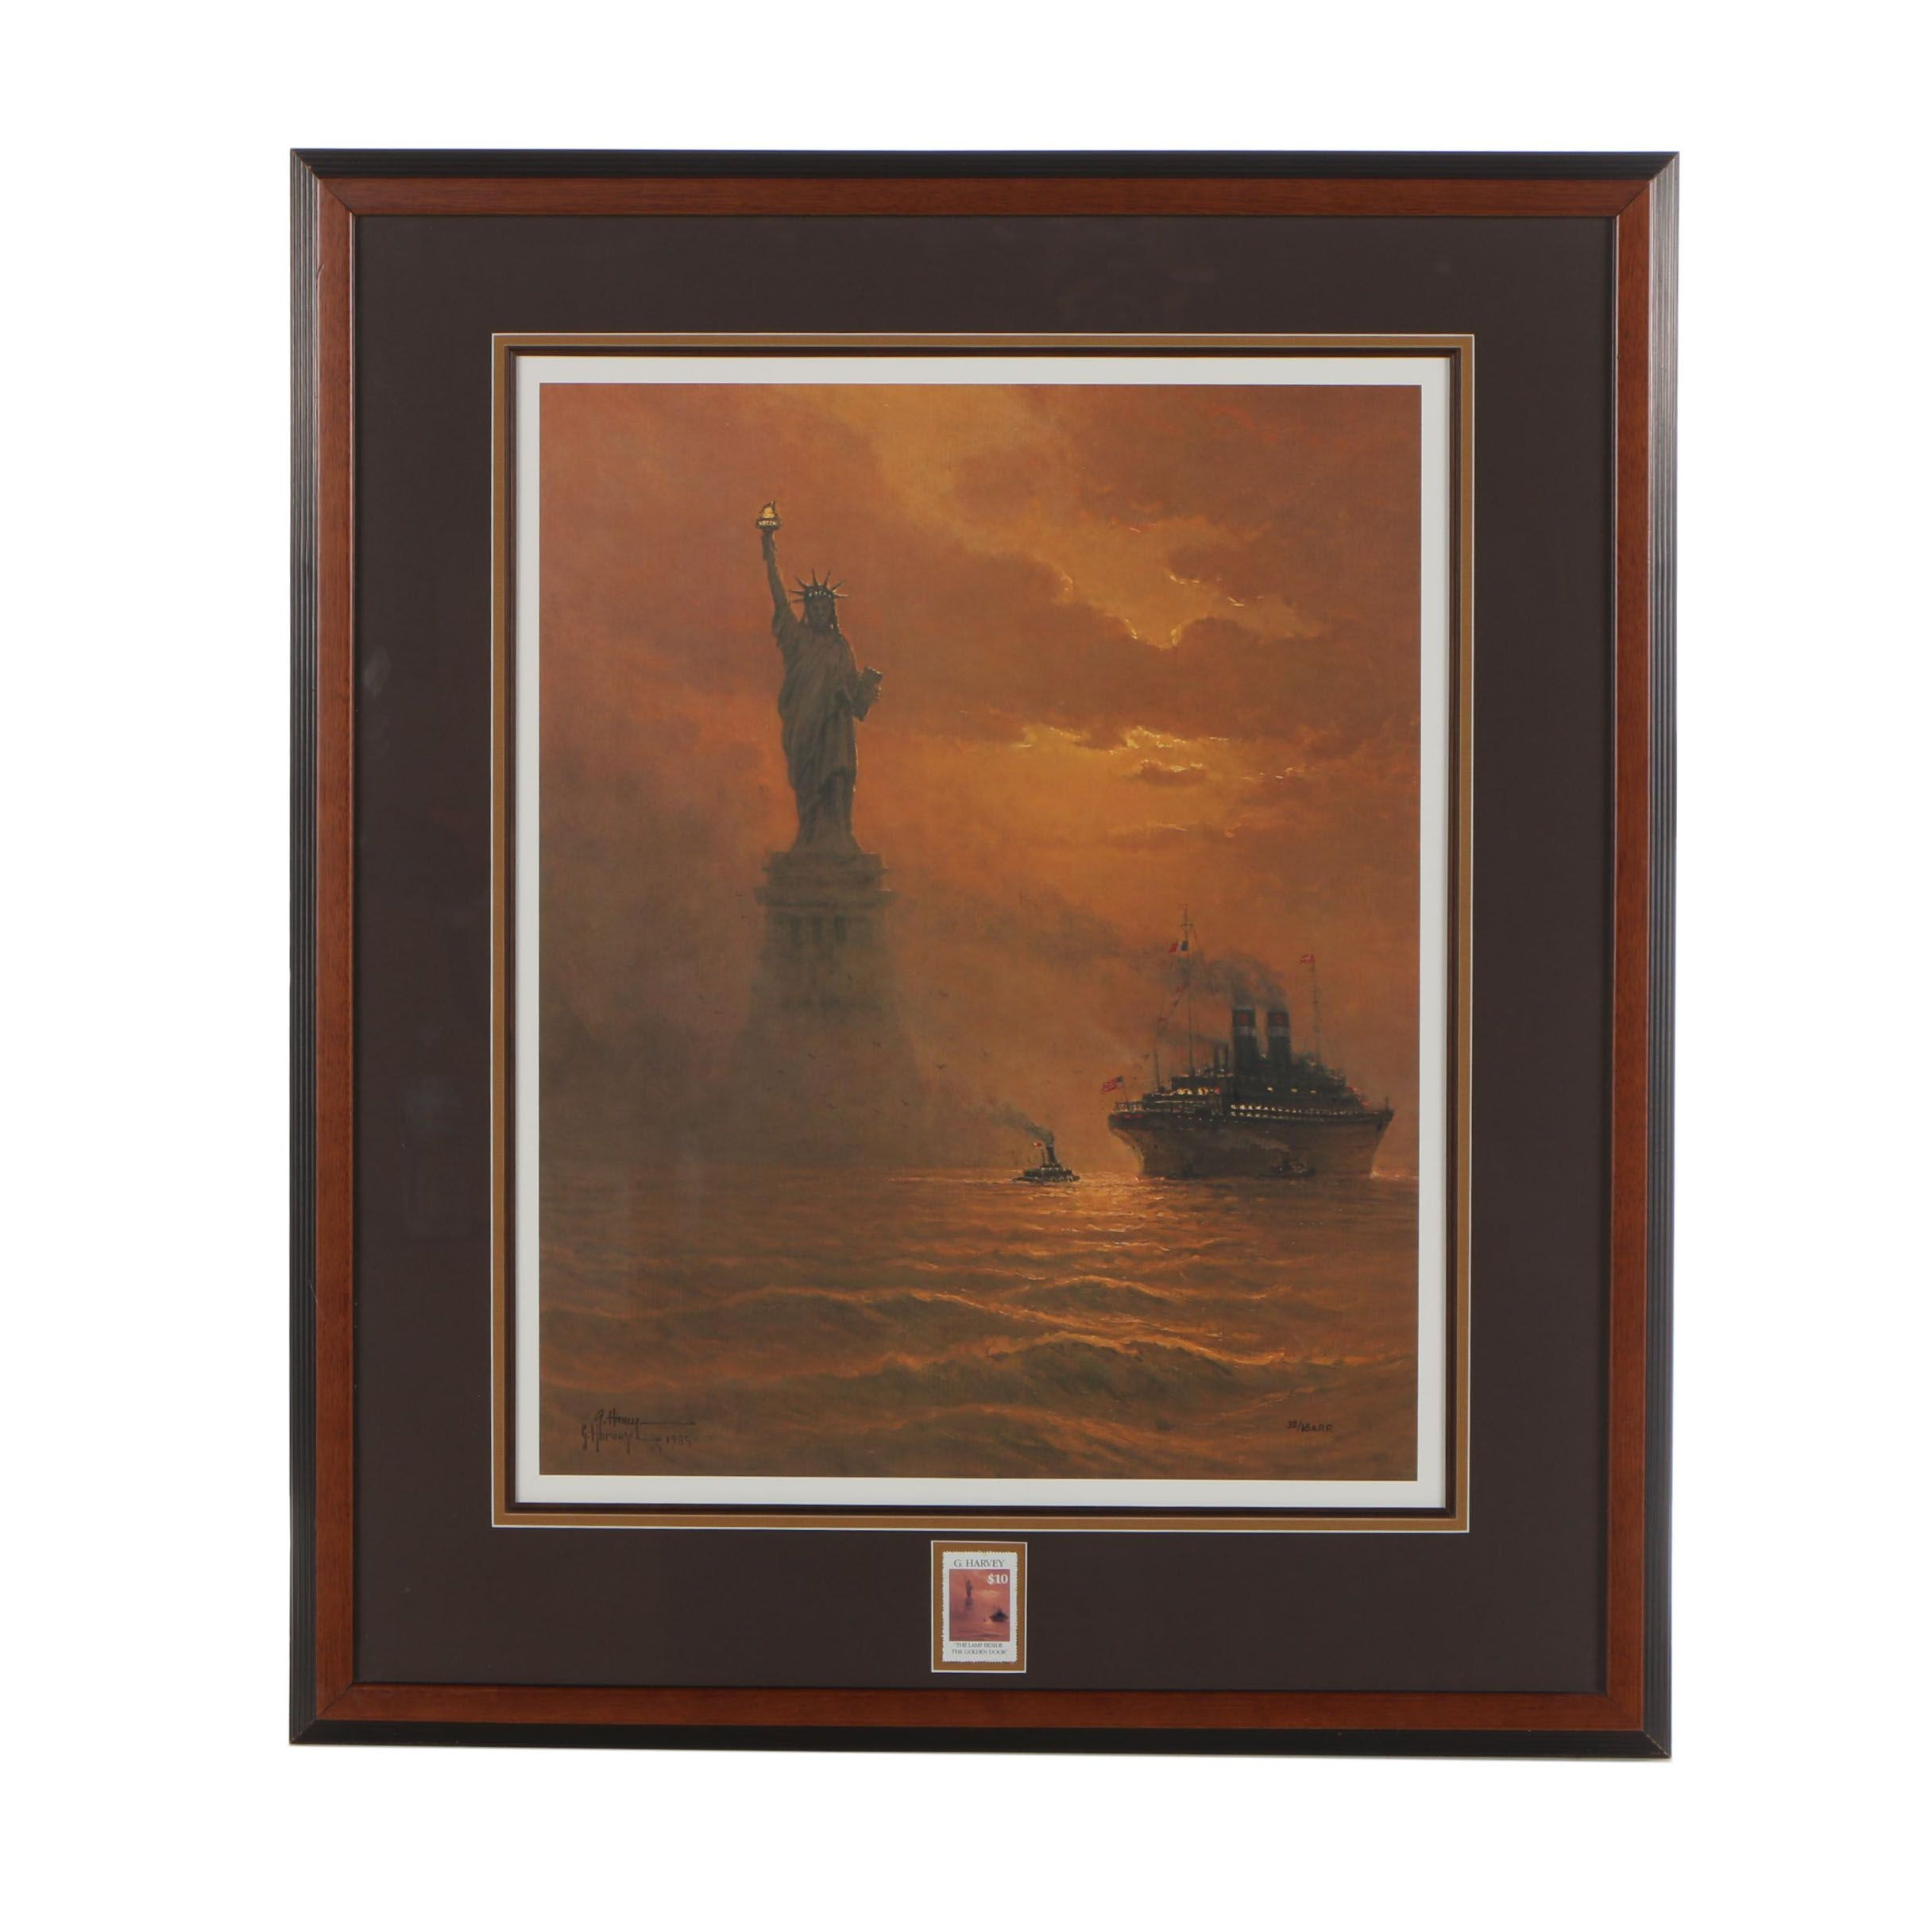 "Gerald Harvey Jones 1985 Offset Lithograph ""The Lamp Beside the Golden Door"""